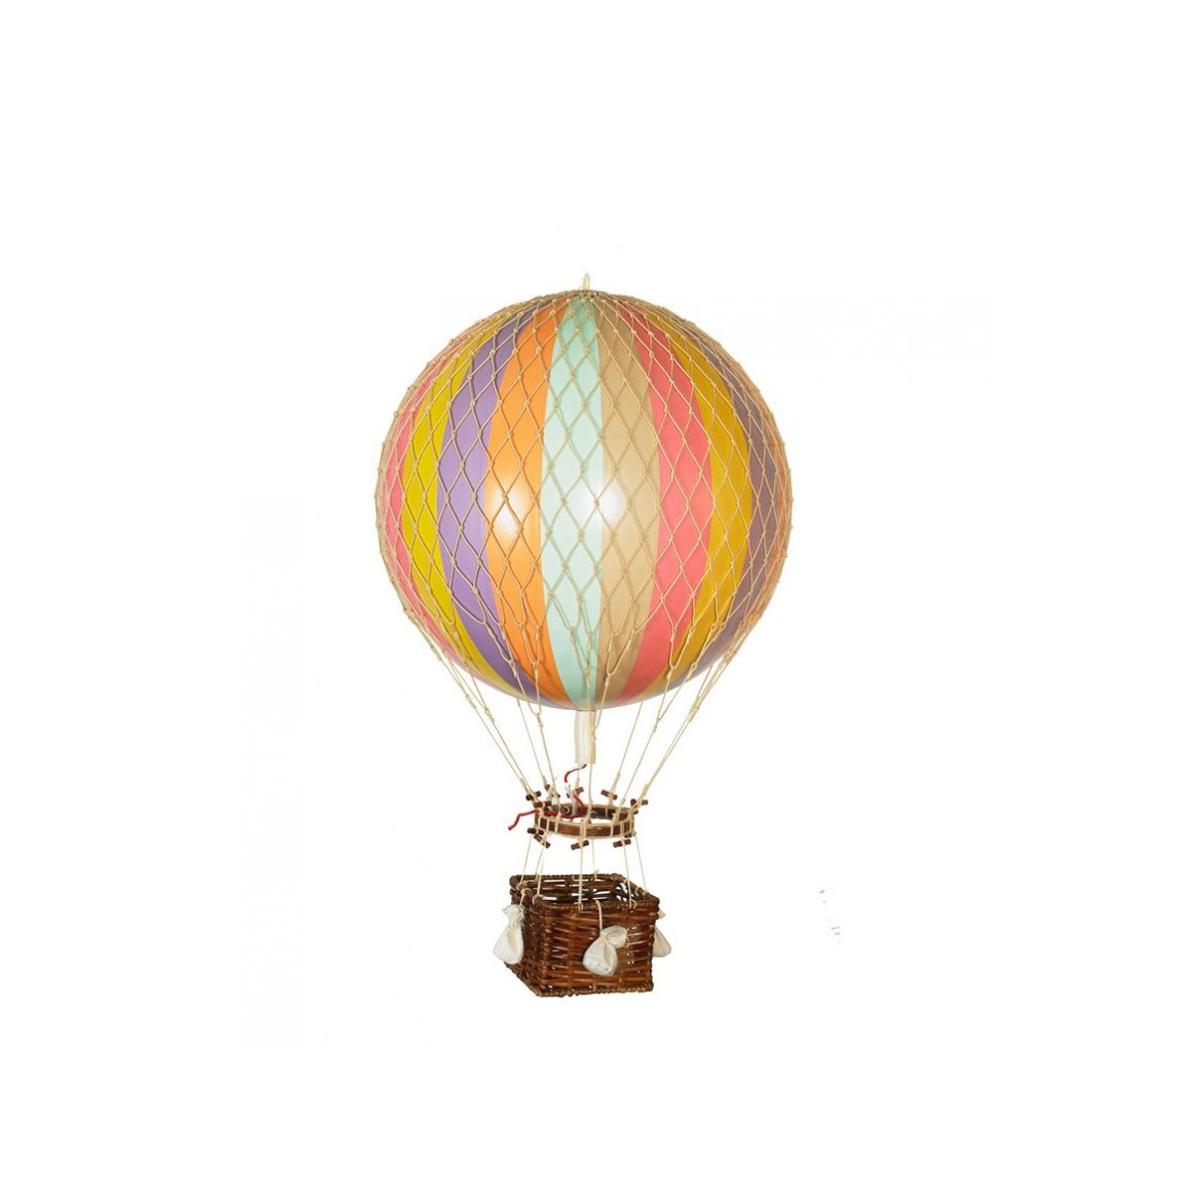 Image of Authentic Models luftballon 8,5 cm - pastel regnbue